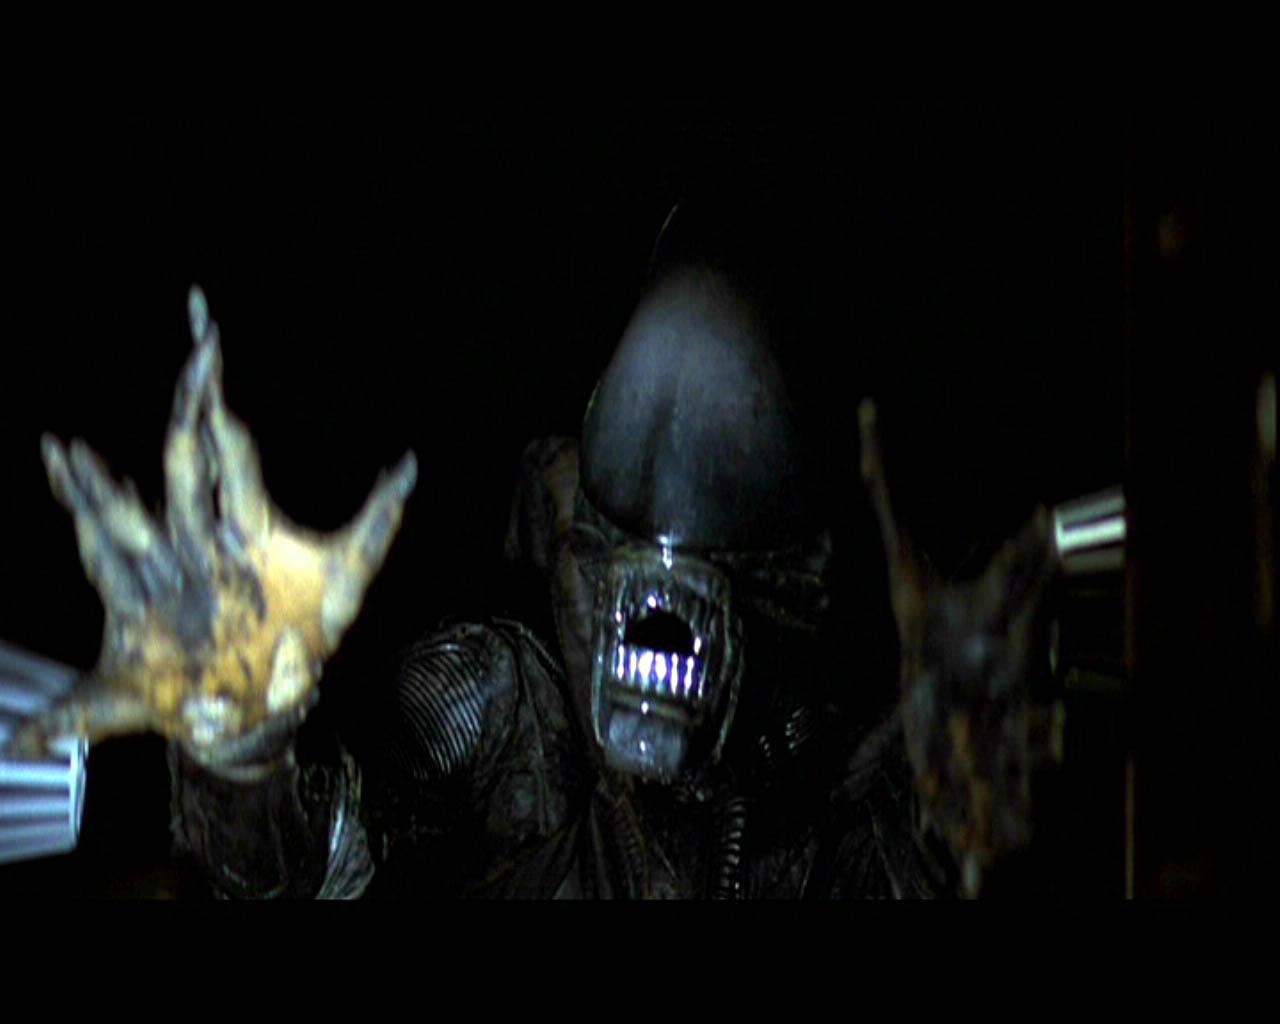 Movie Alien Wallpaper 1280x1024 Movie Alien 1280x1024